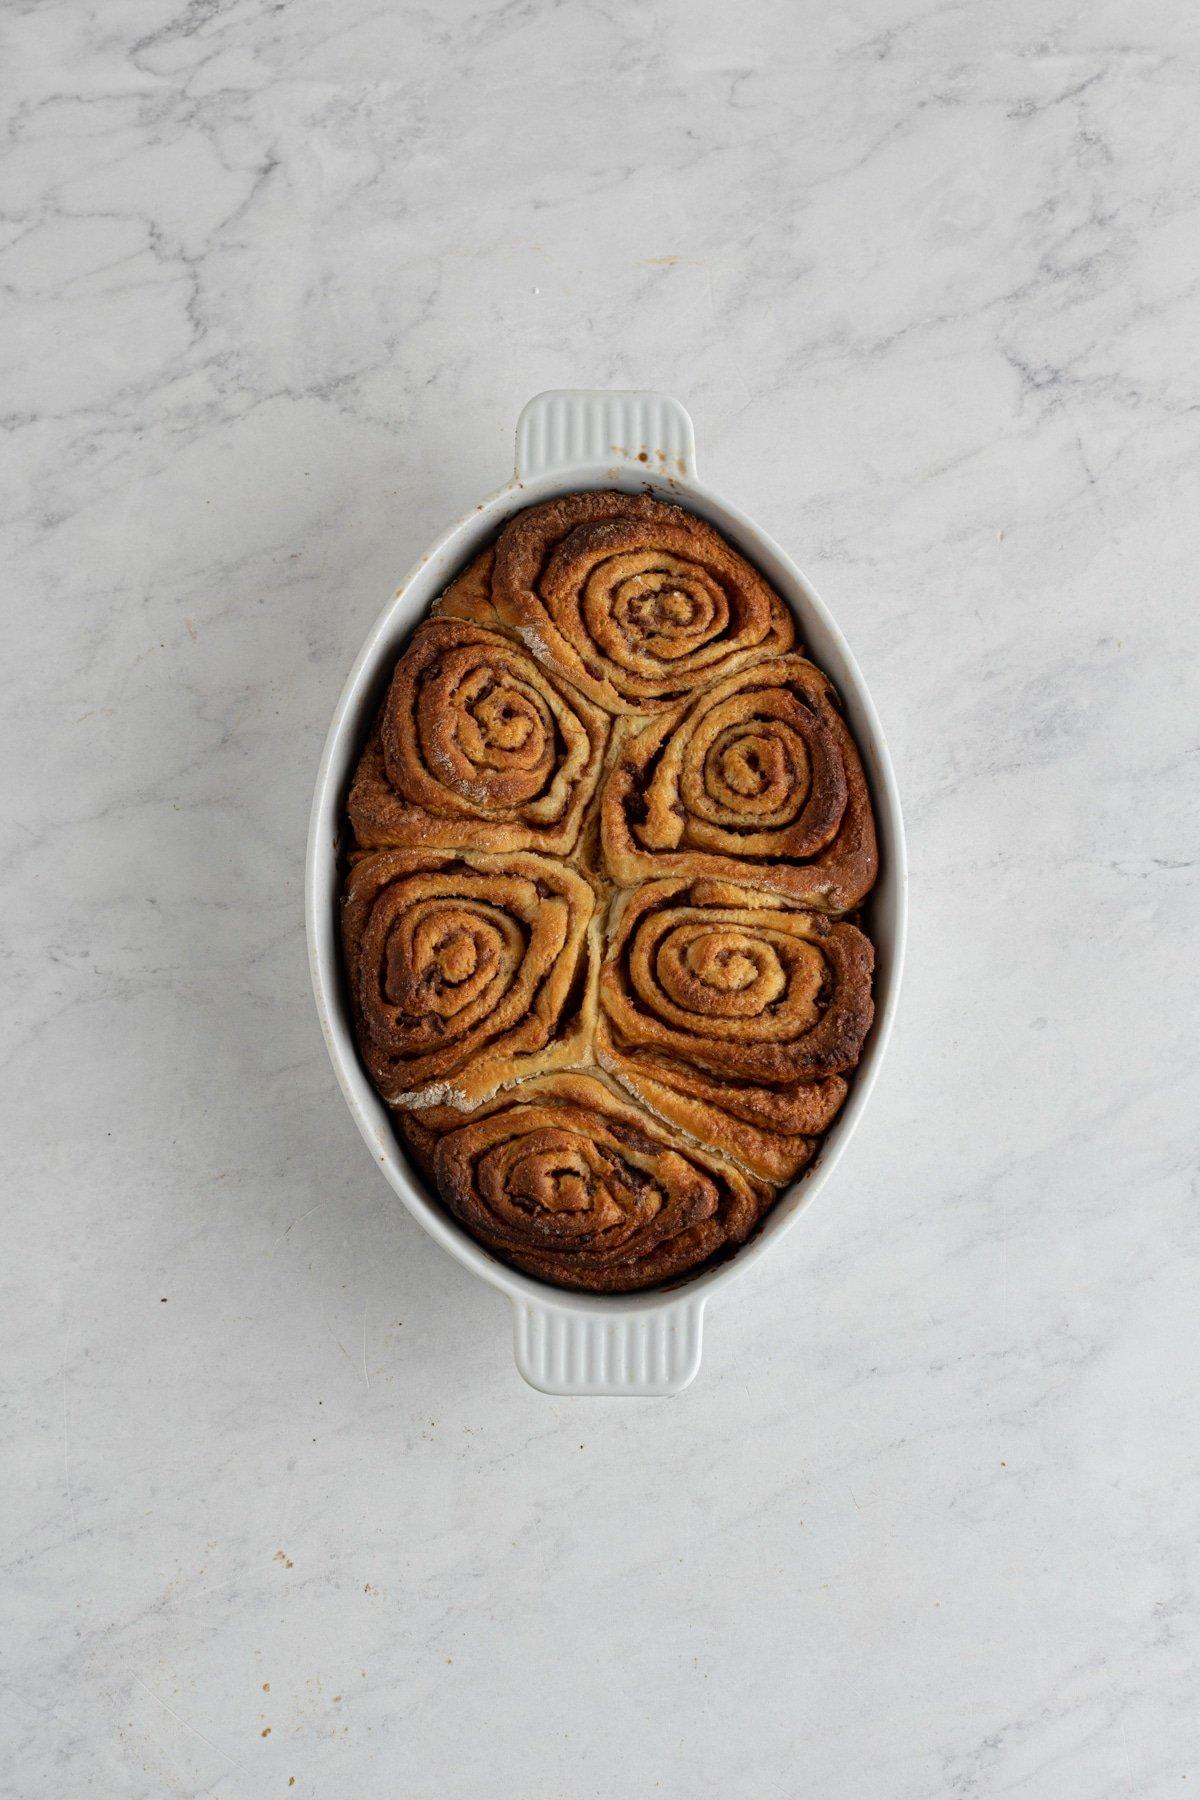 baked bacon cinnamon rolls in a baking dish